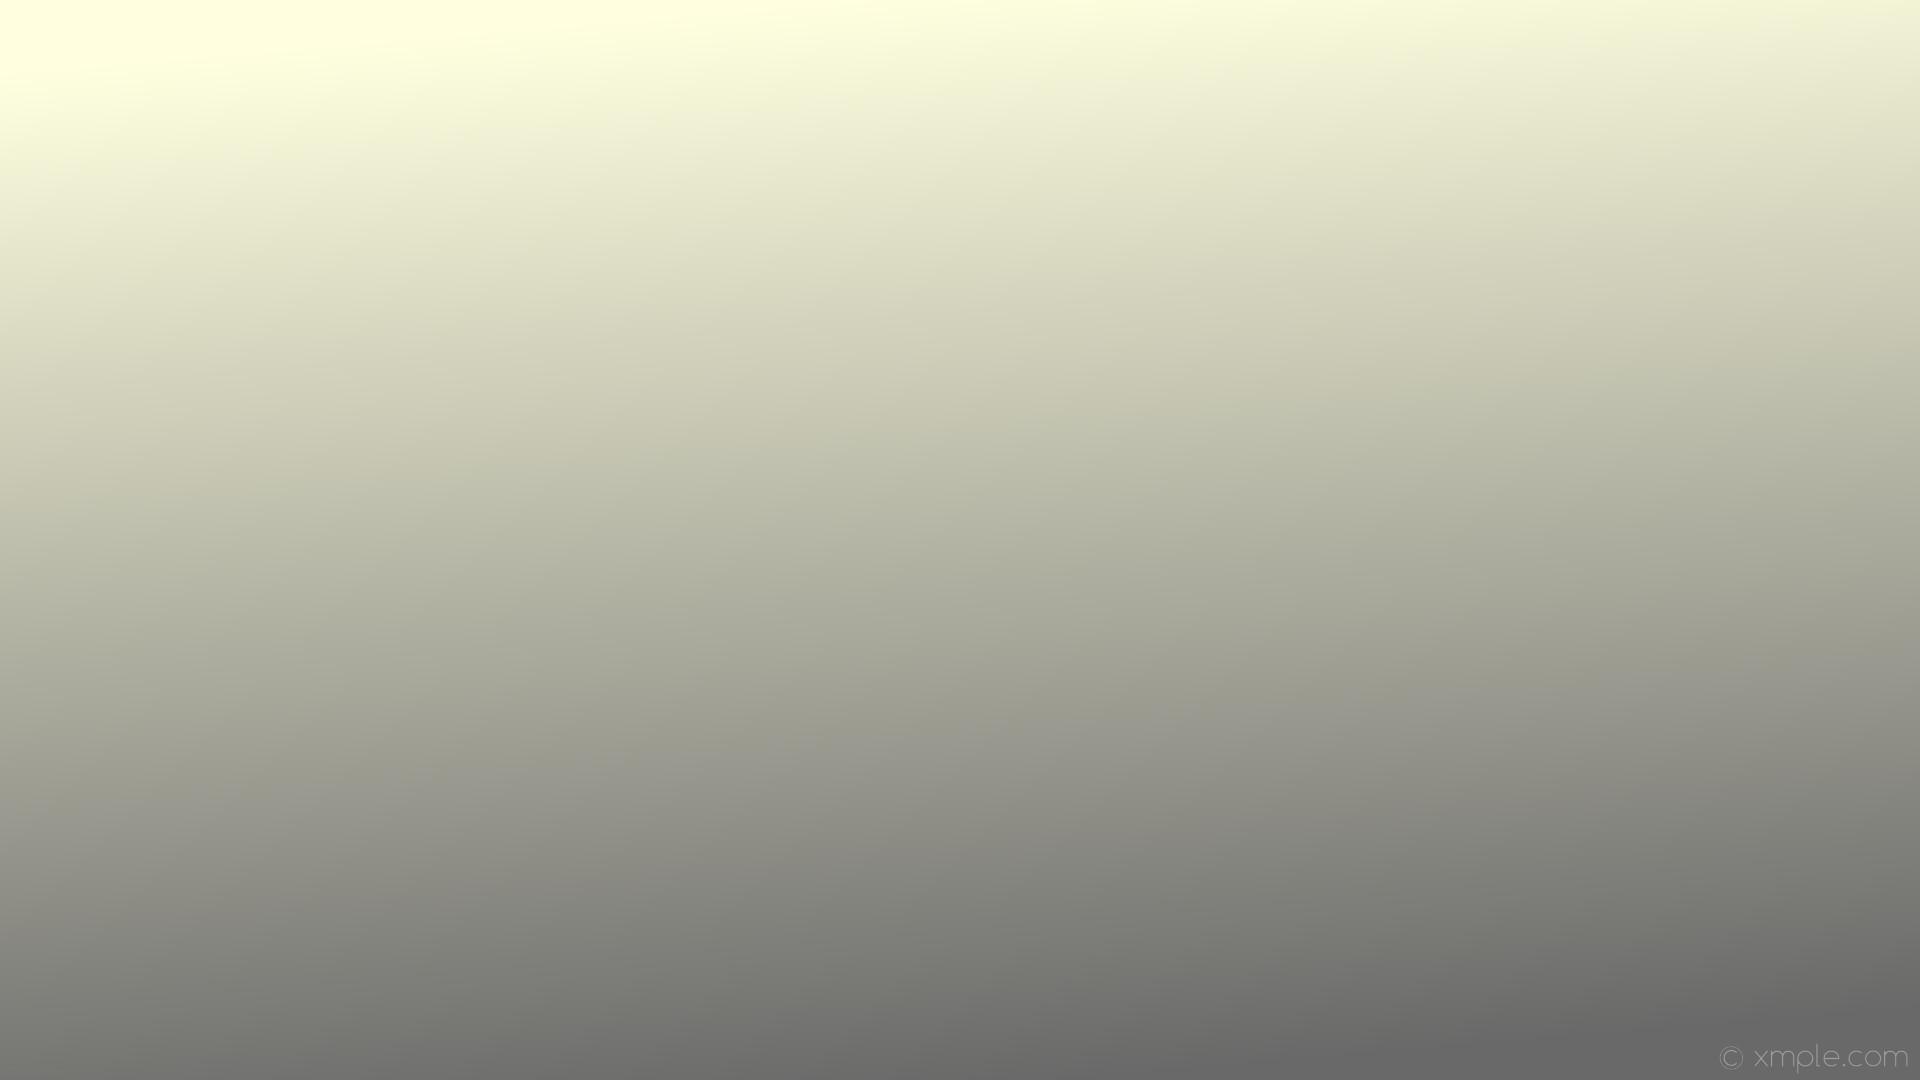 wallpaper grey yellow gradient linear light yellow dim gray #ffffe0 #696969  105°